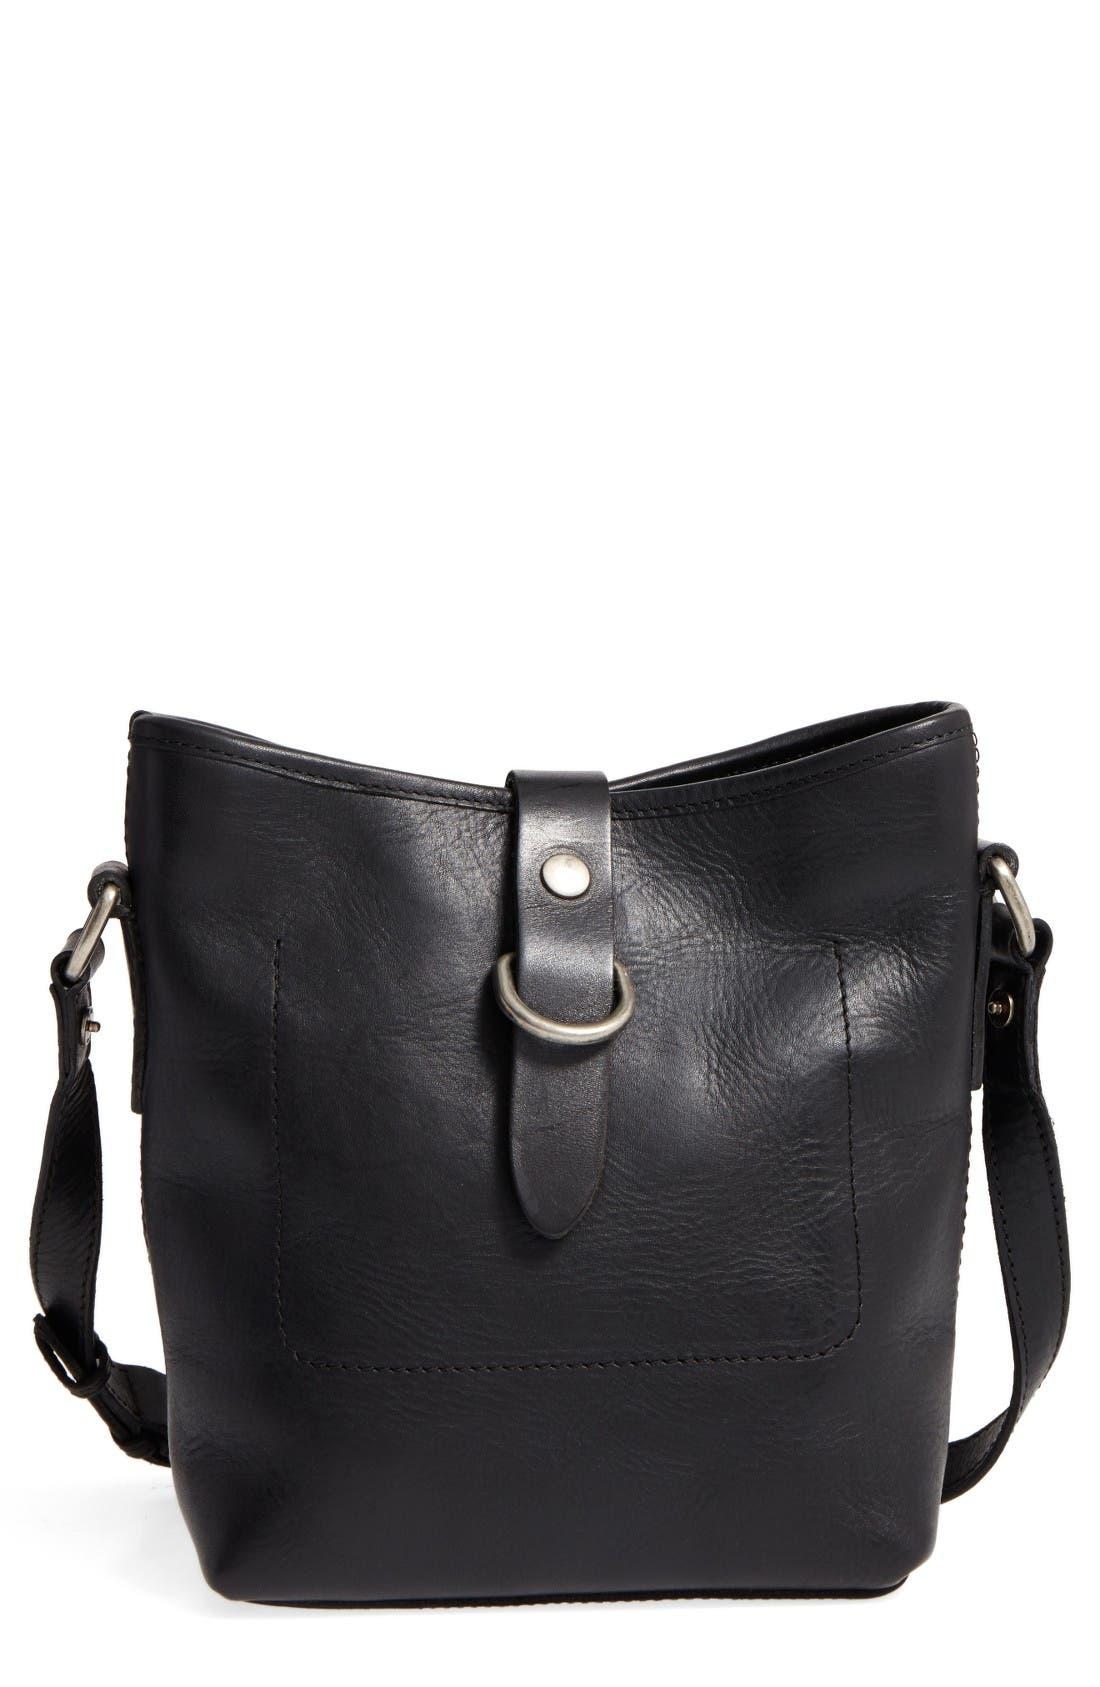 Main Image - Frye Amy Leather Crossbody Bag